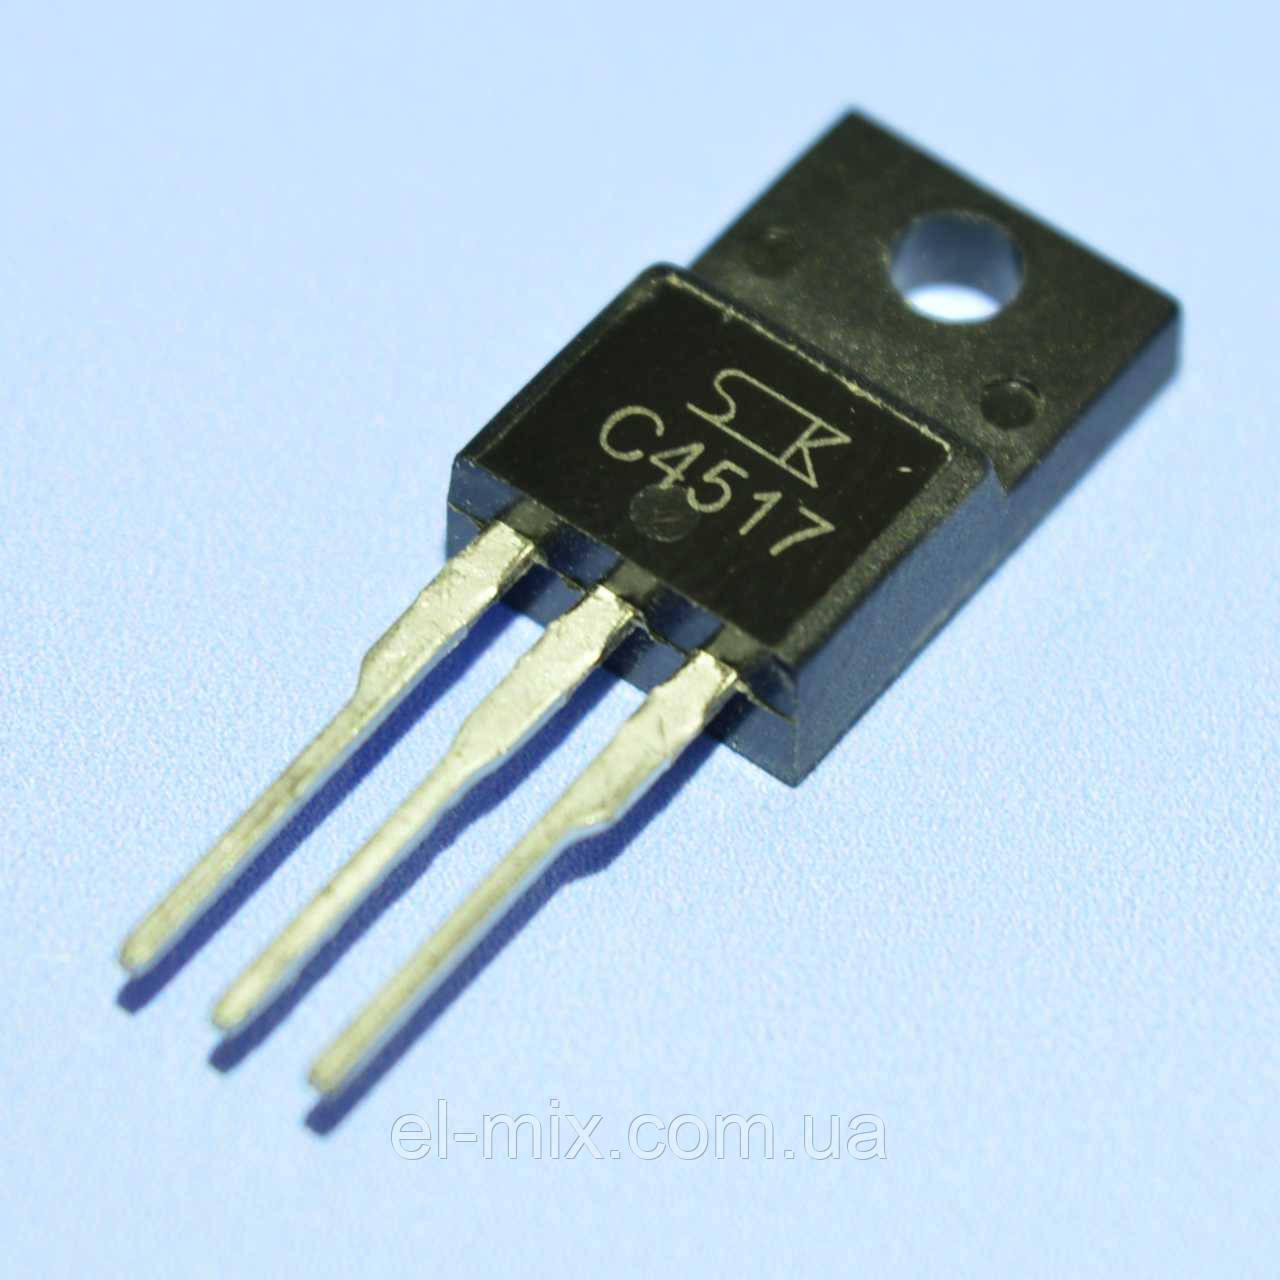 Транзистор биполярный 2SC4517  TO-220F  Китай